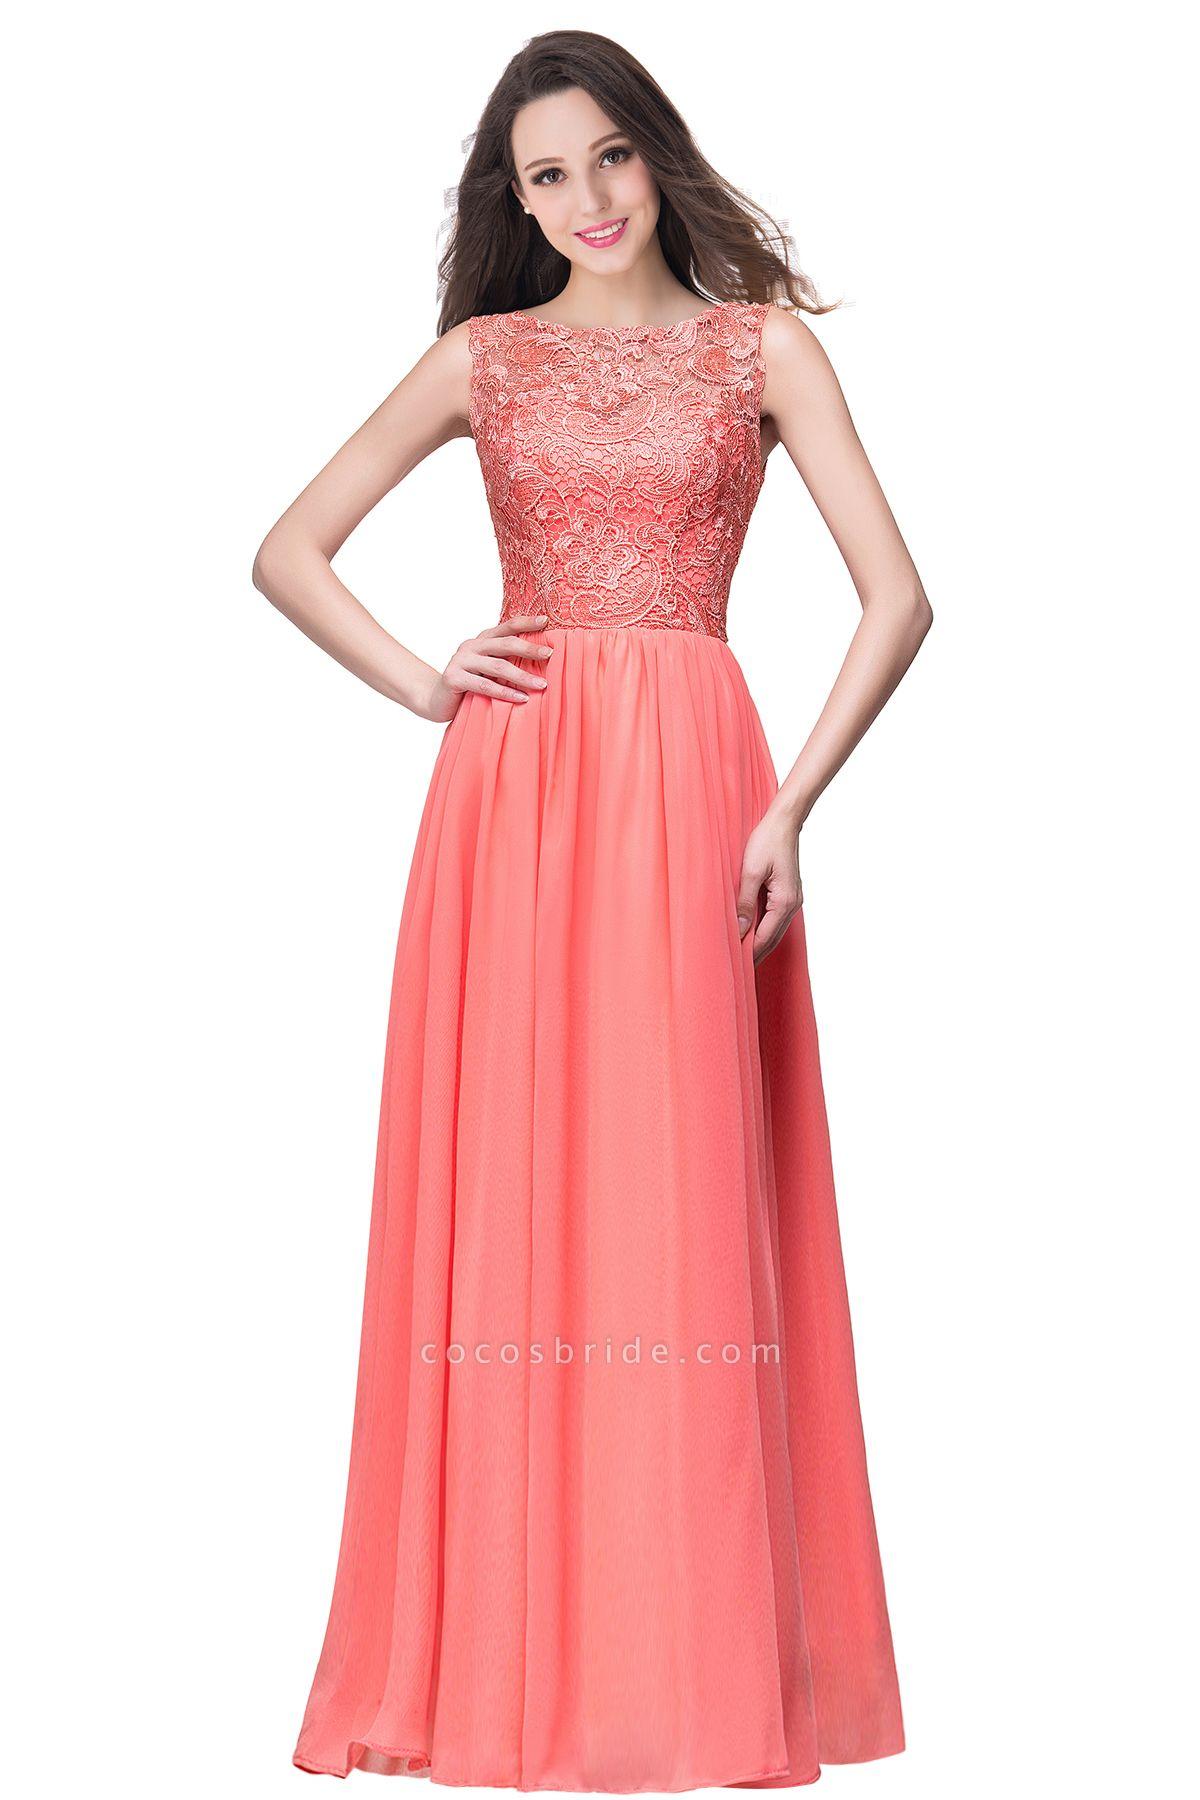 Fascinating Jewel Chiffon A-line Bridesmaid Dress